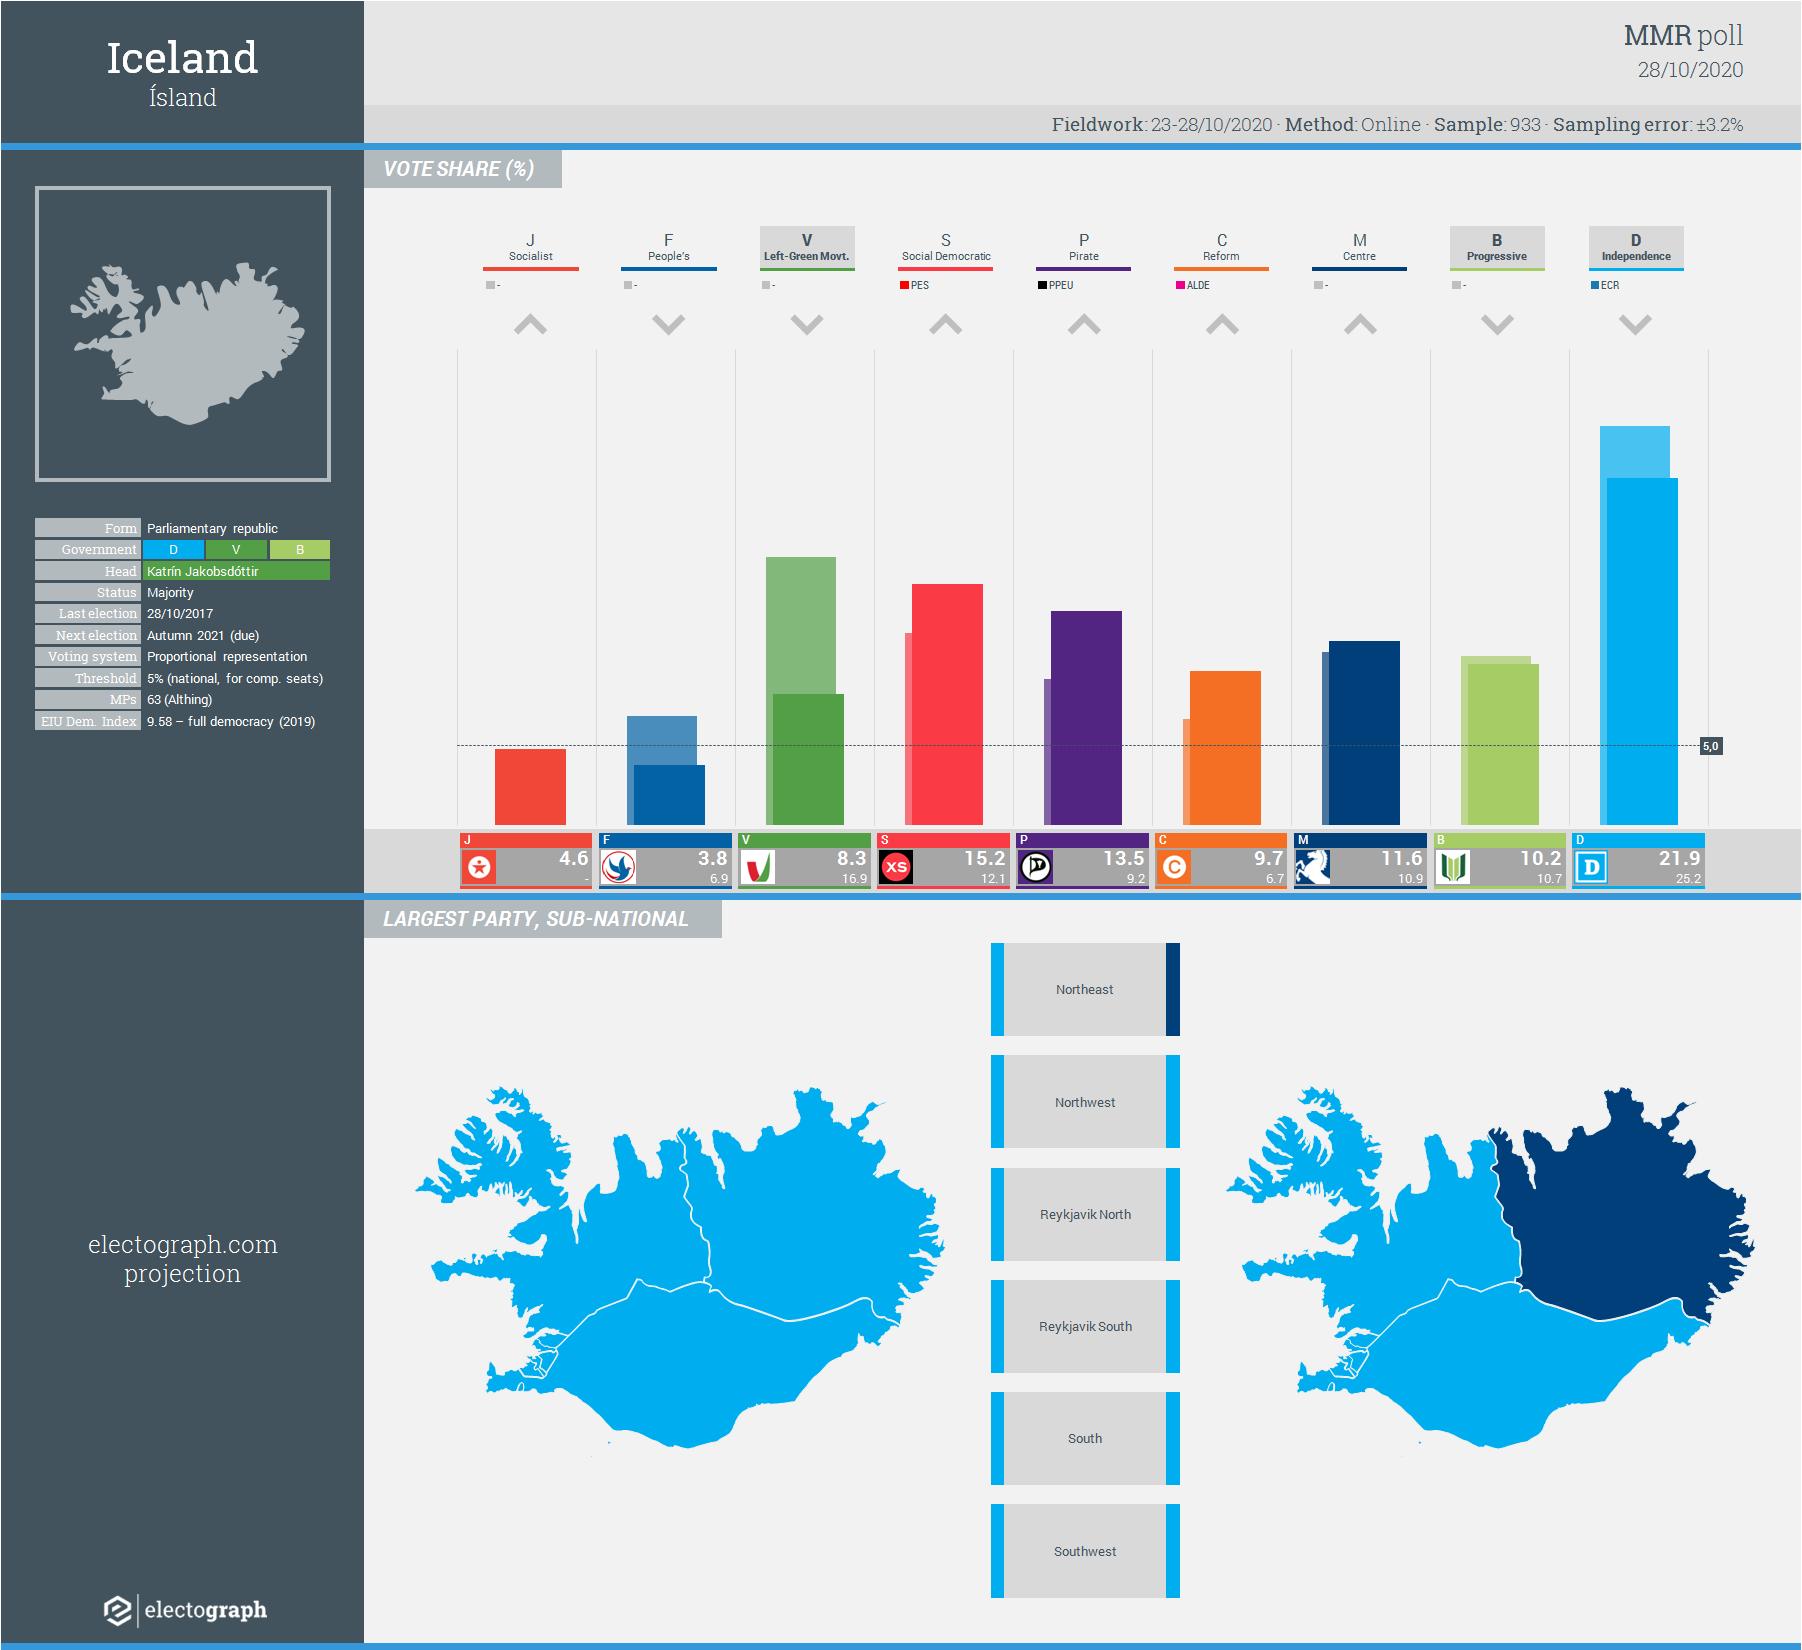 ICELAND: MMR poll chart, 28 October 2020